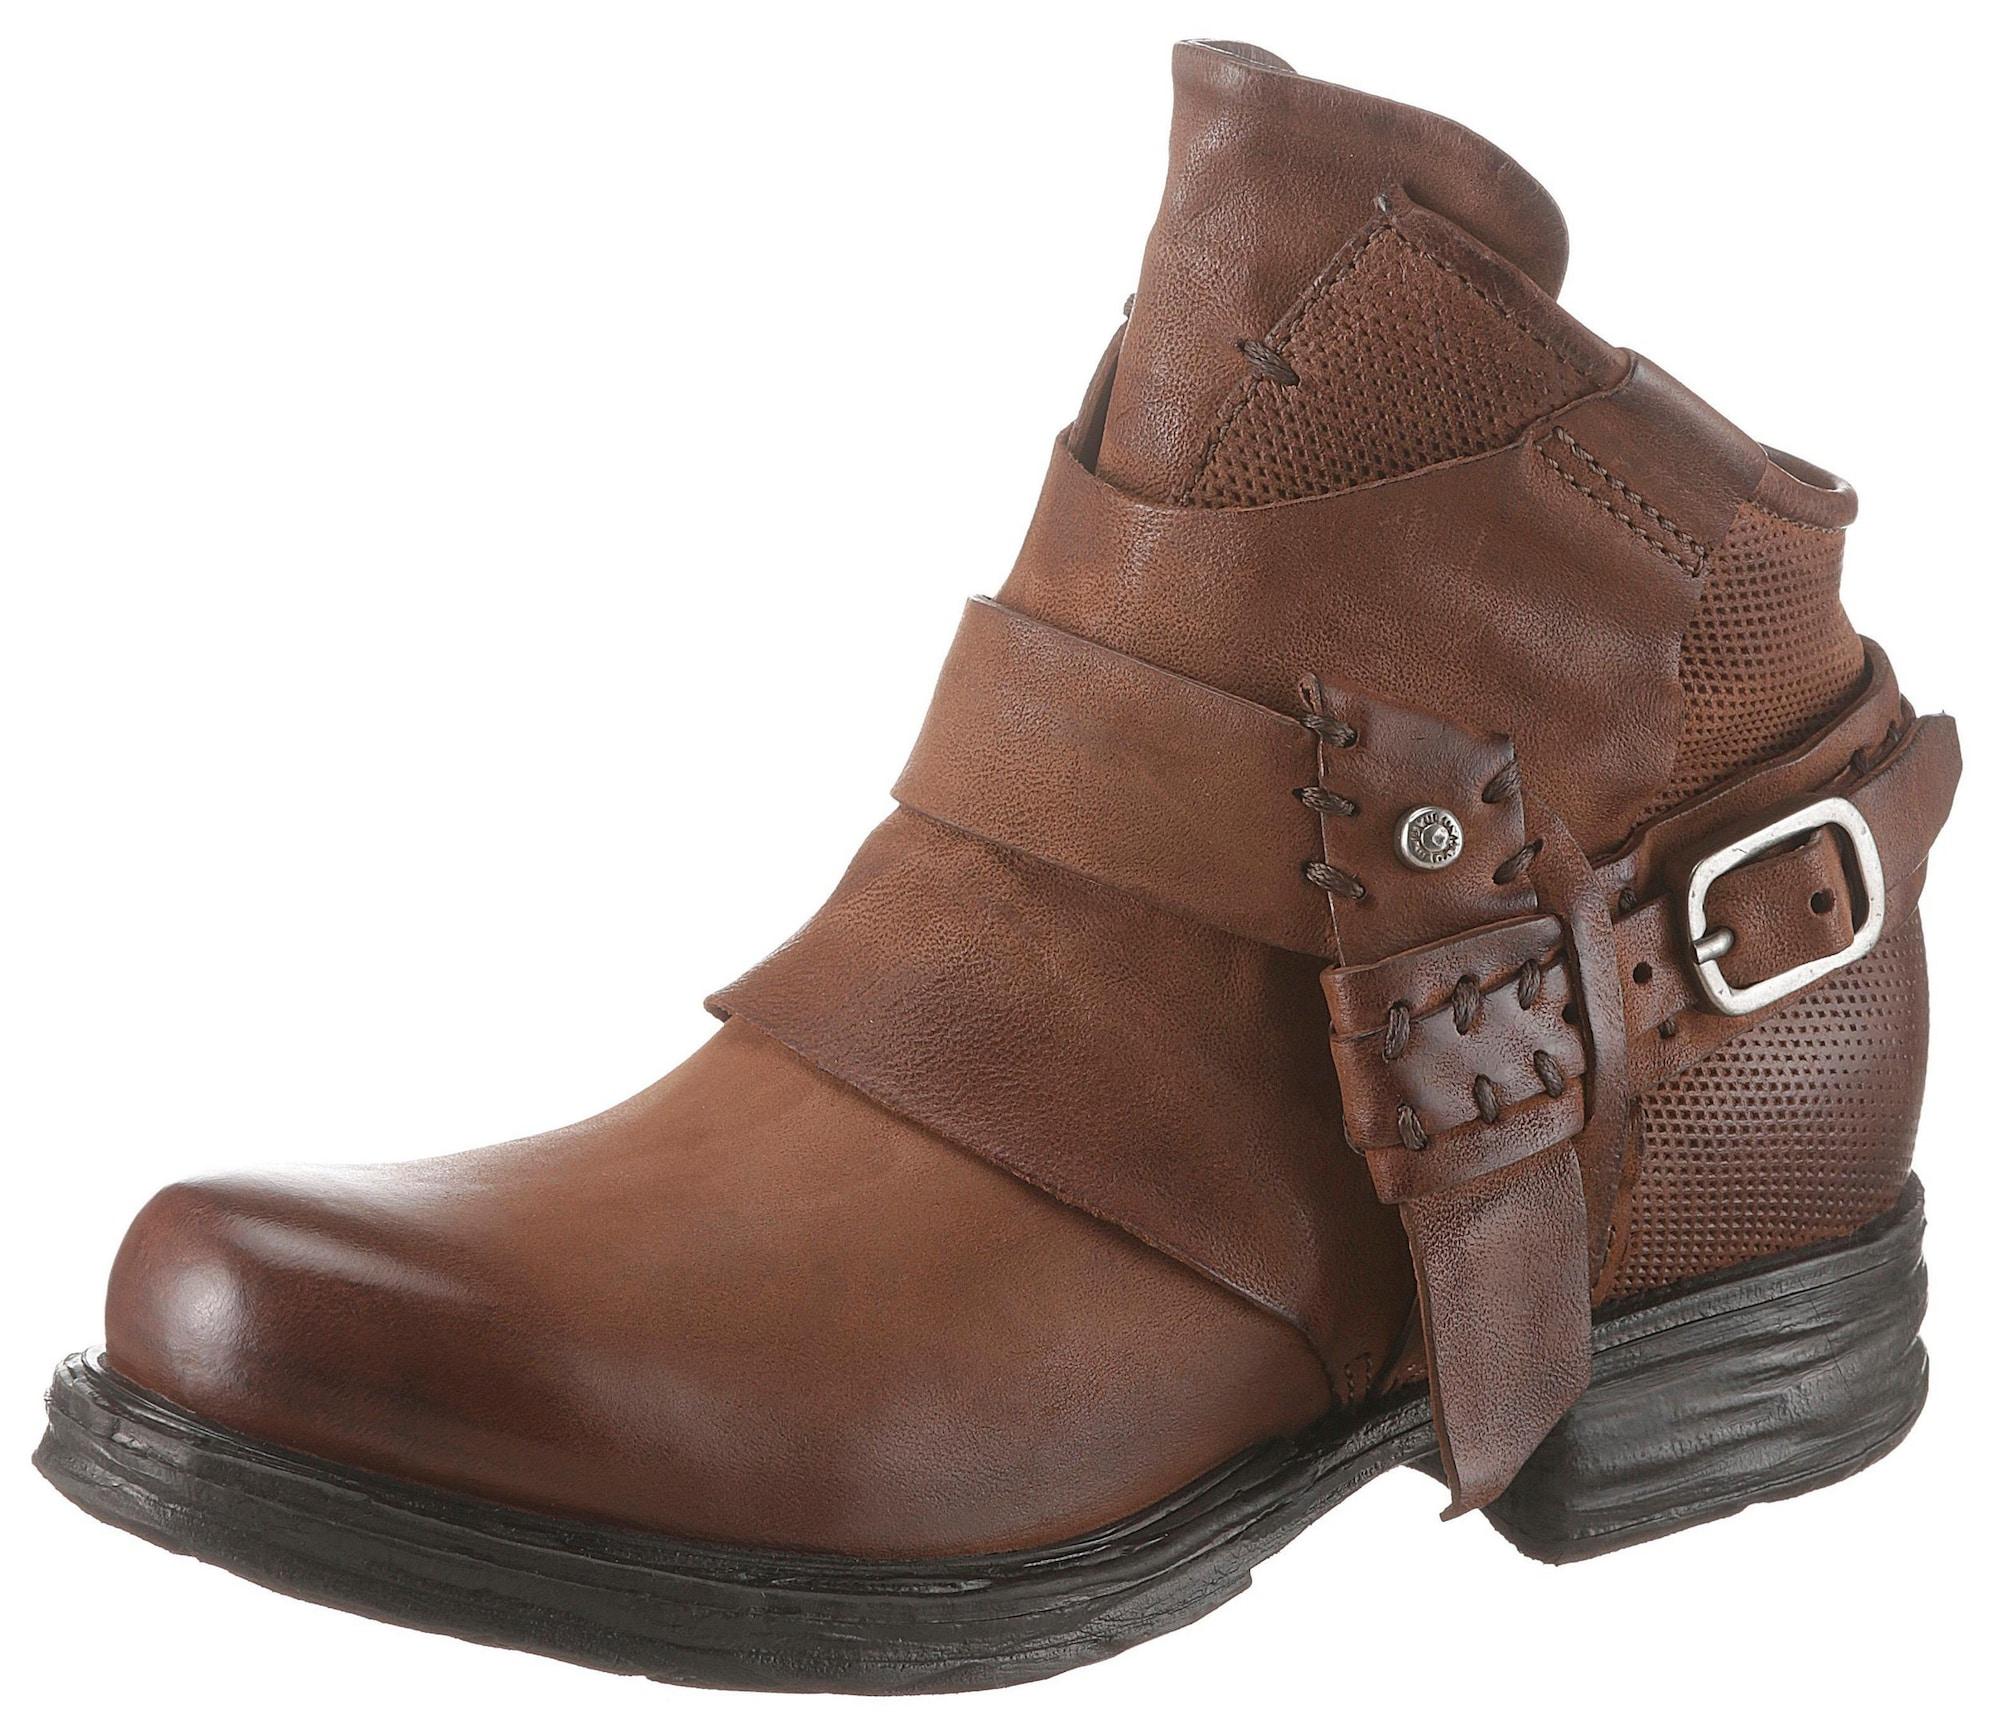 Bikerboots   Schuhe > Boots > Bikerboots   Cognac   a.s.98